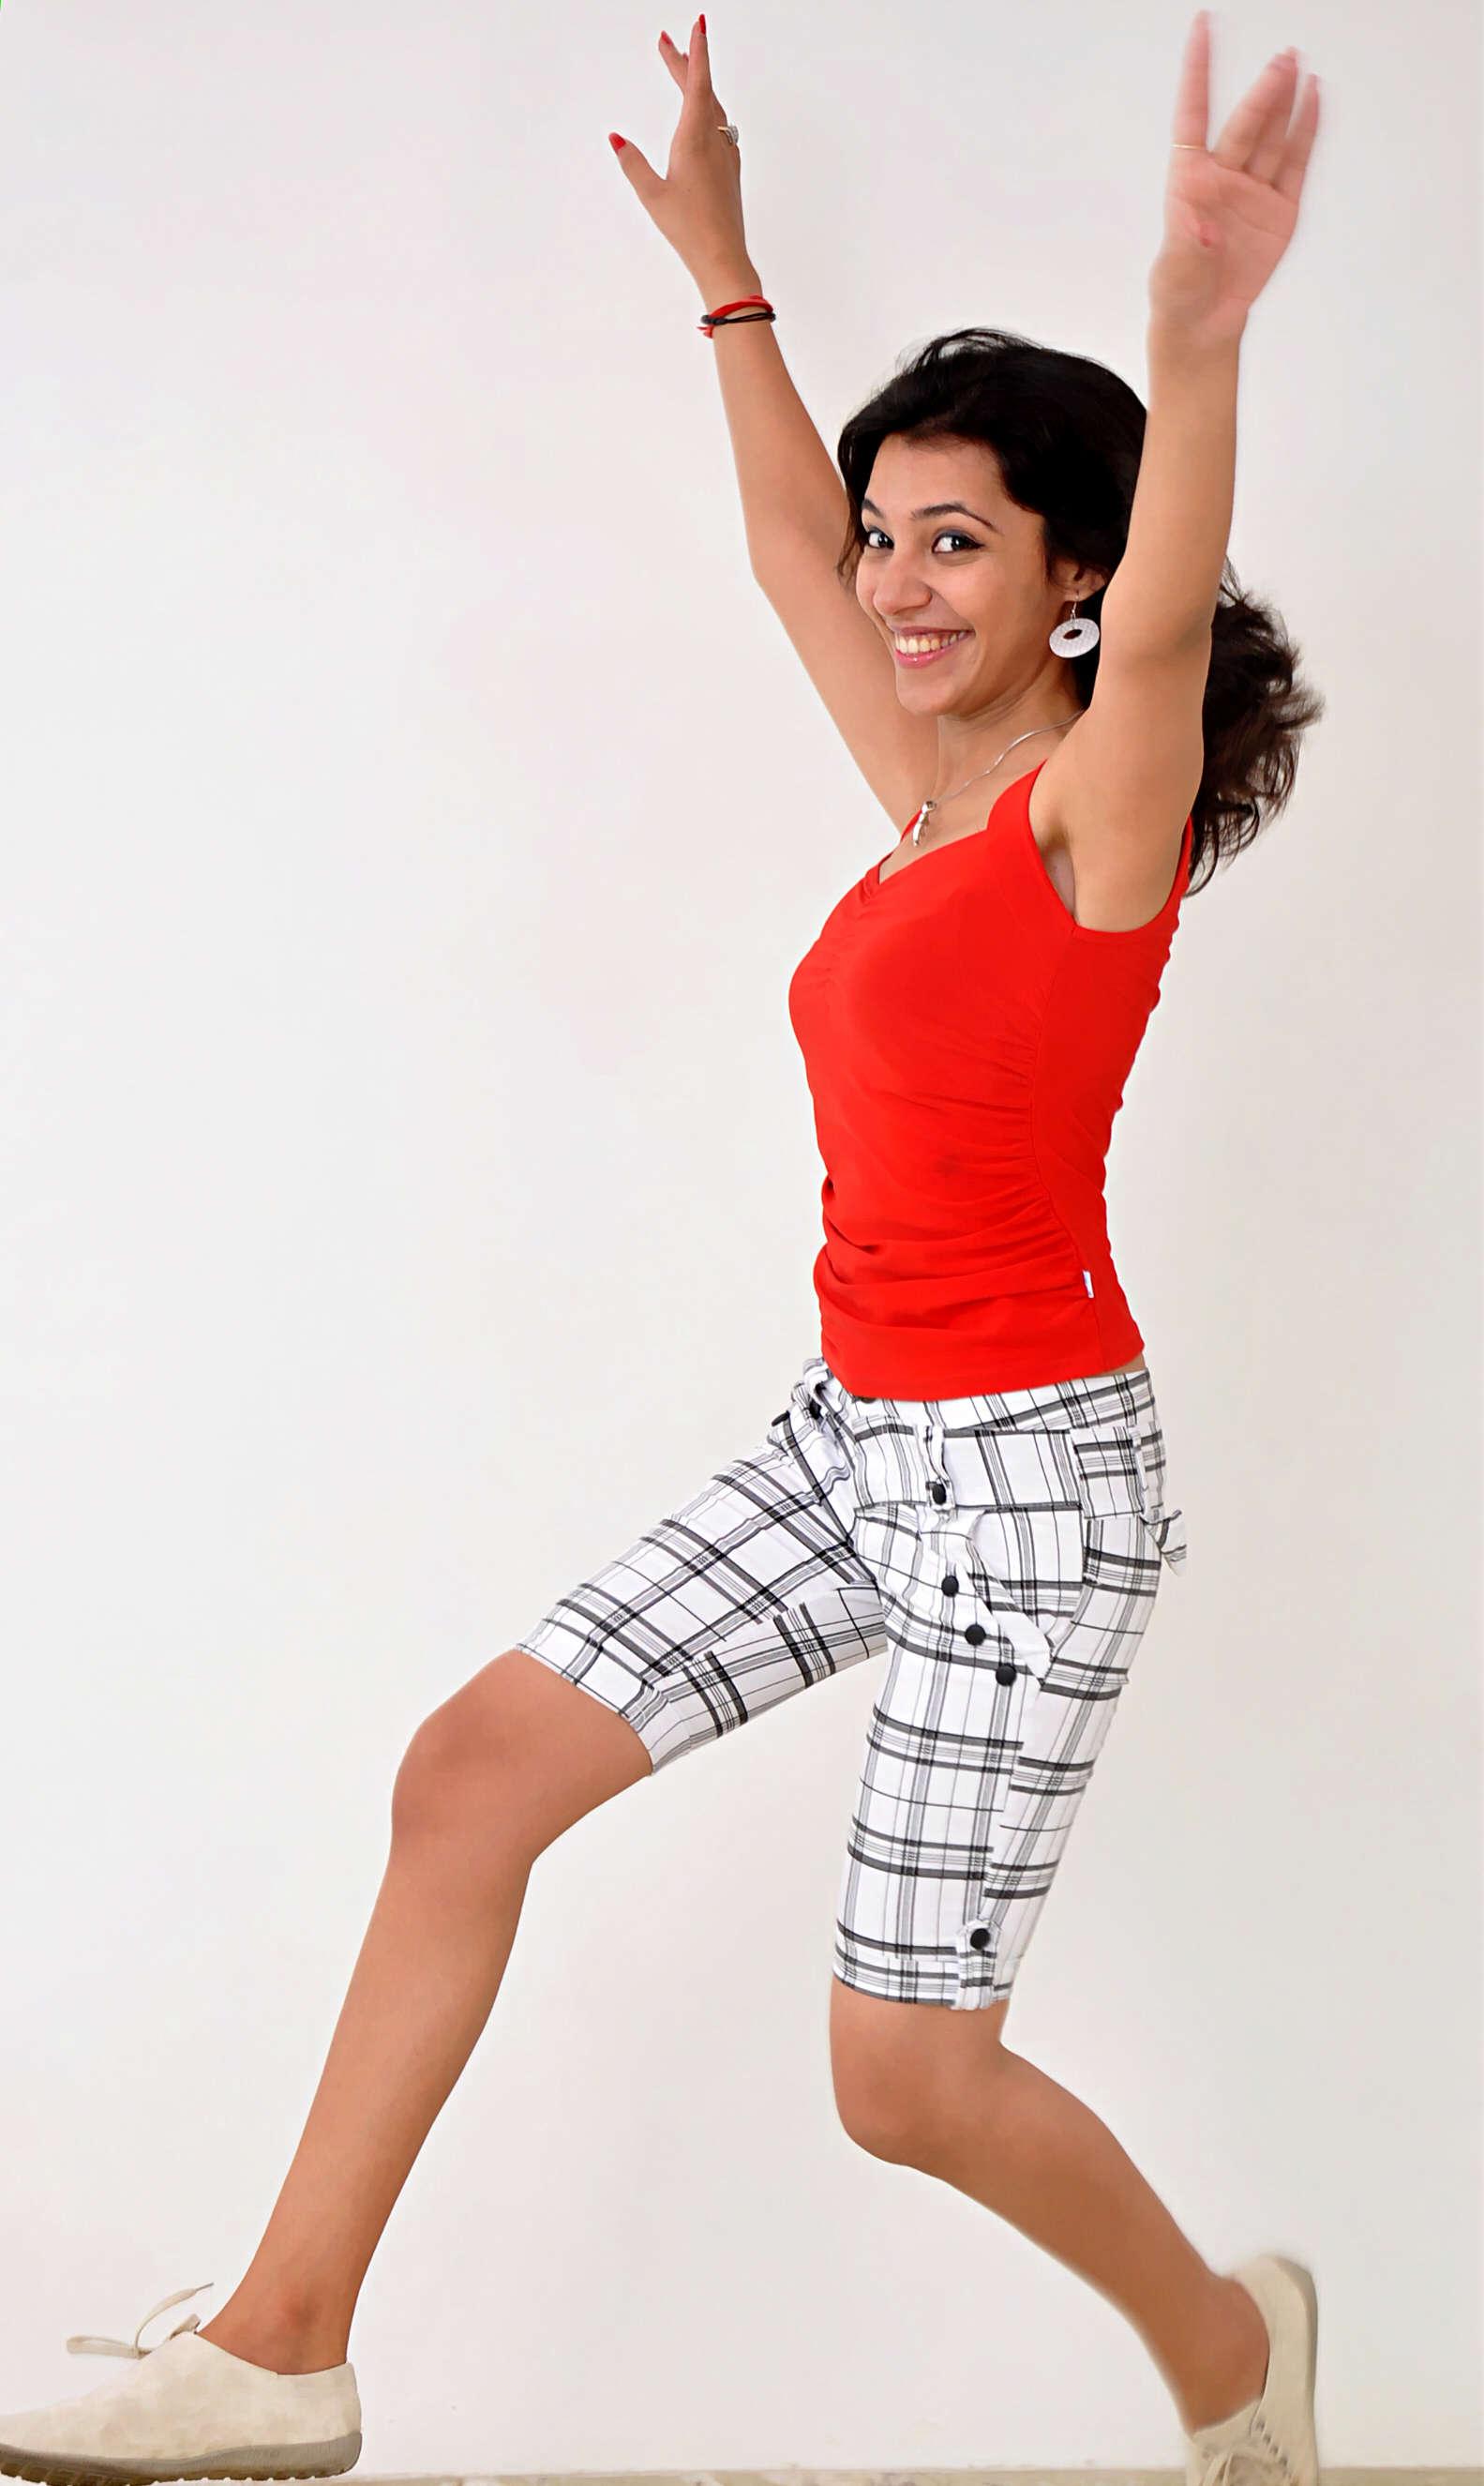 Celebrity fitness expert Runjhun Gupta